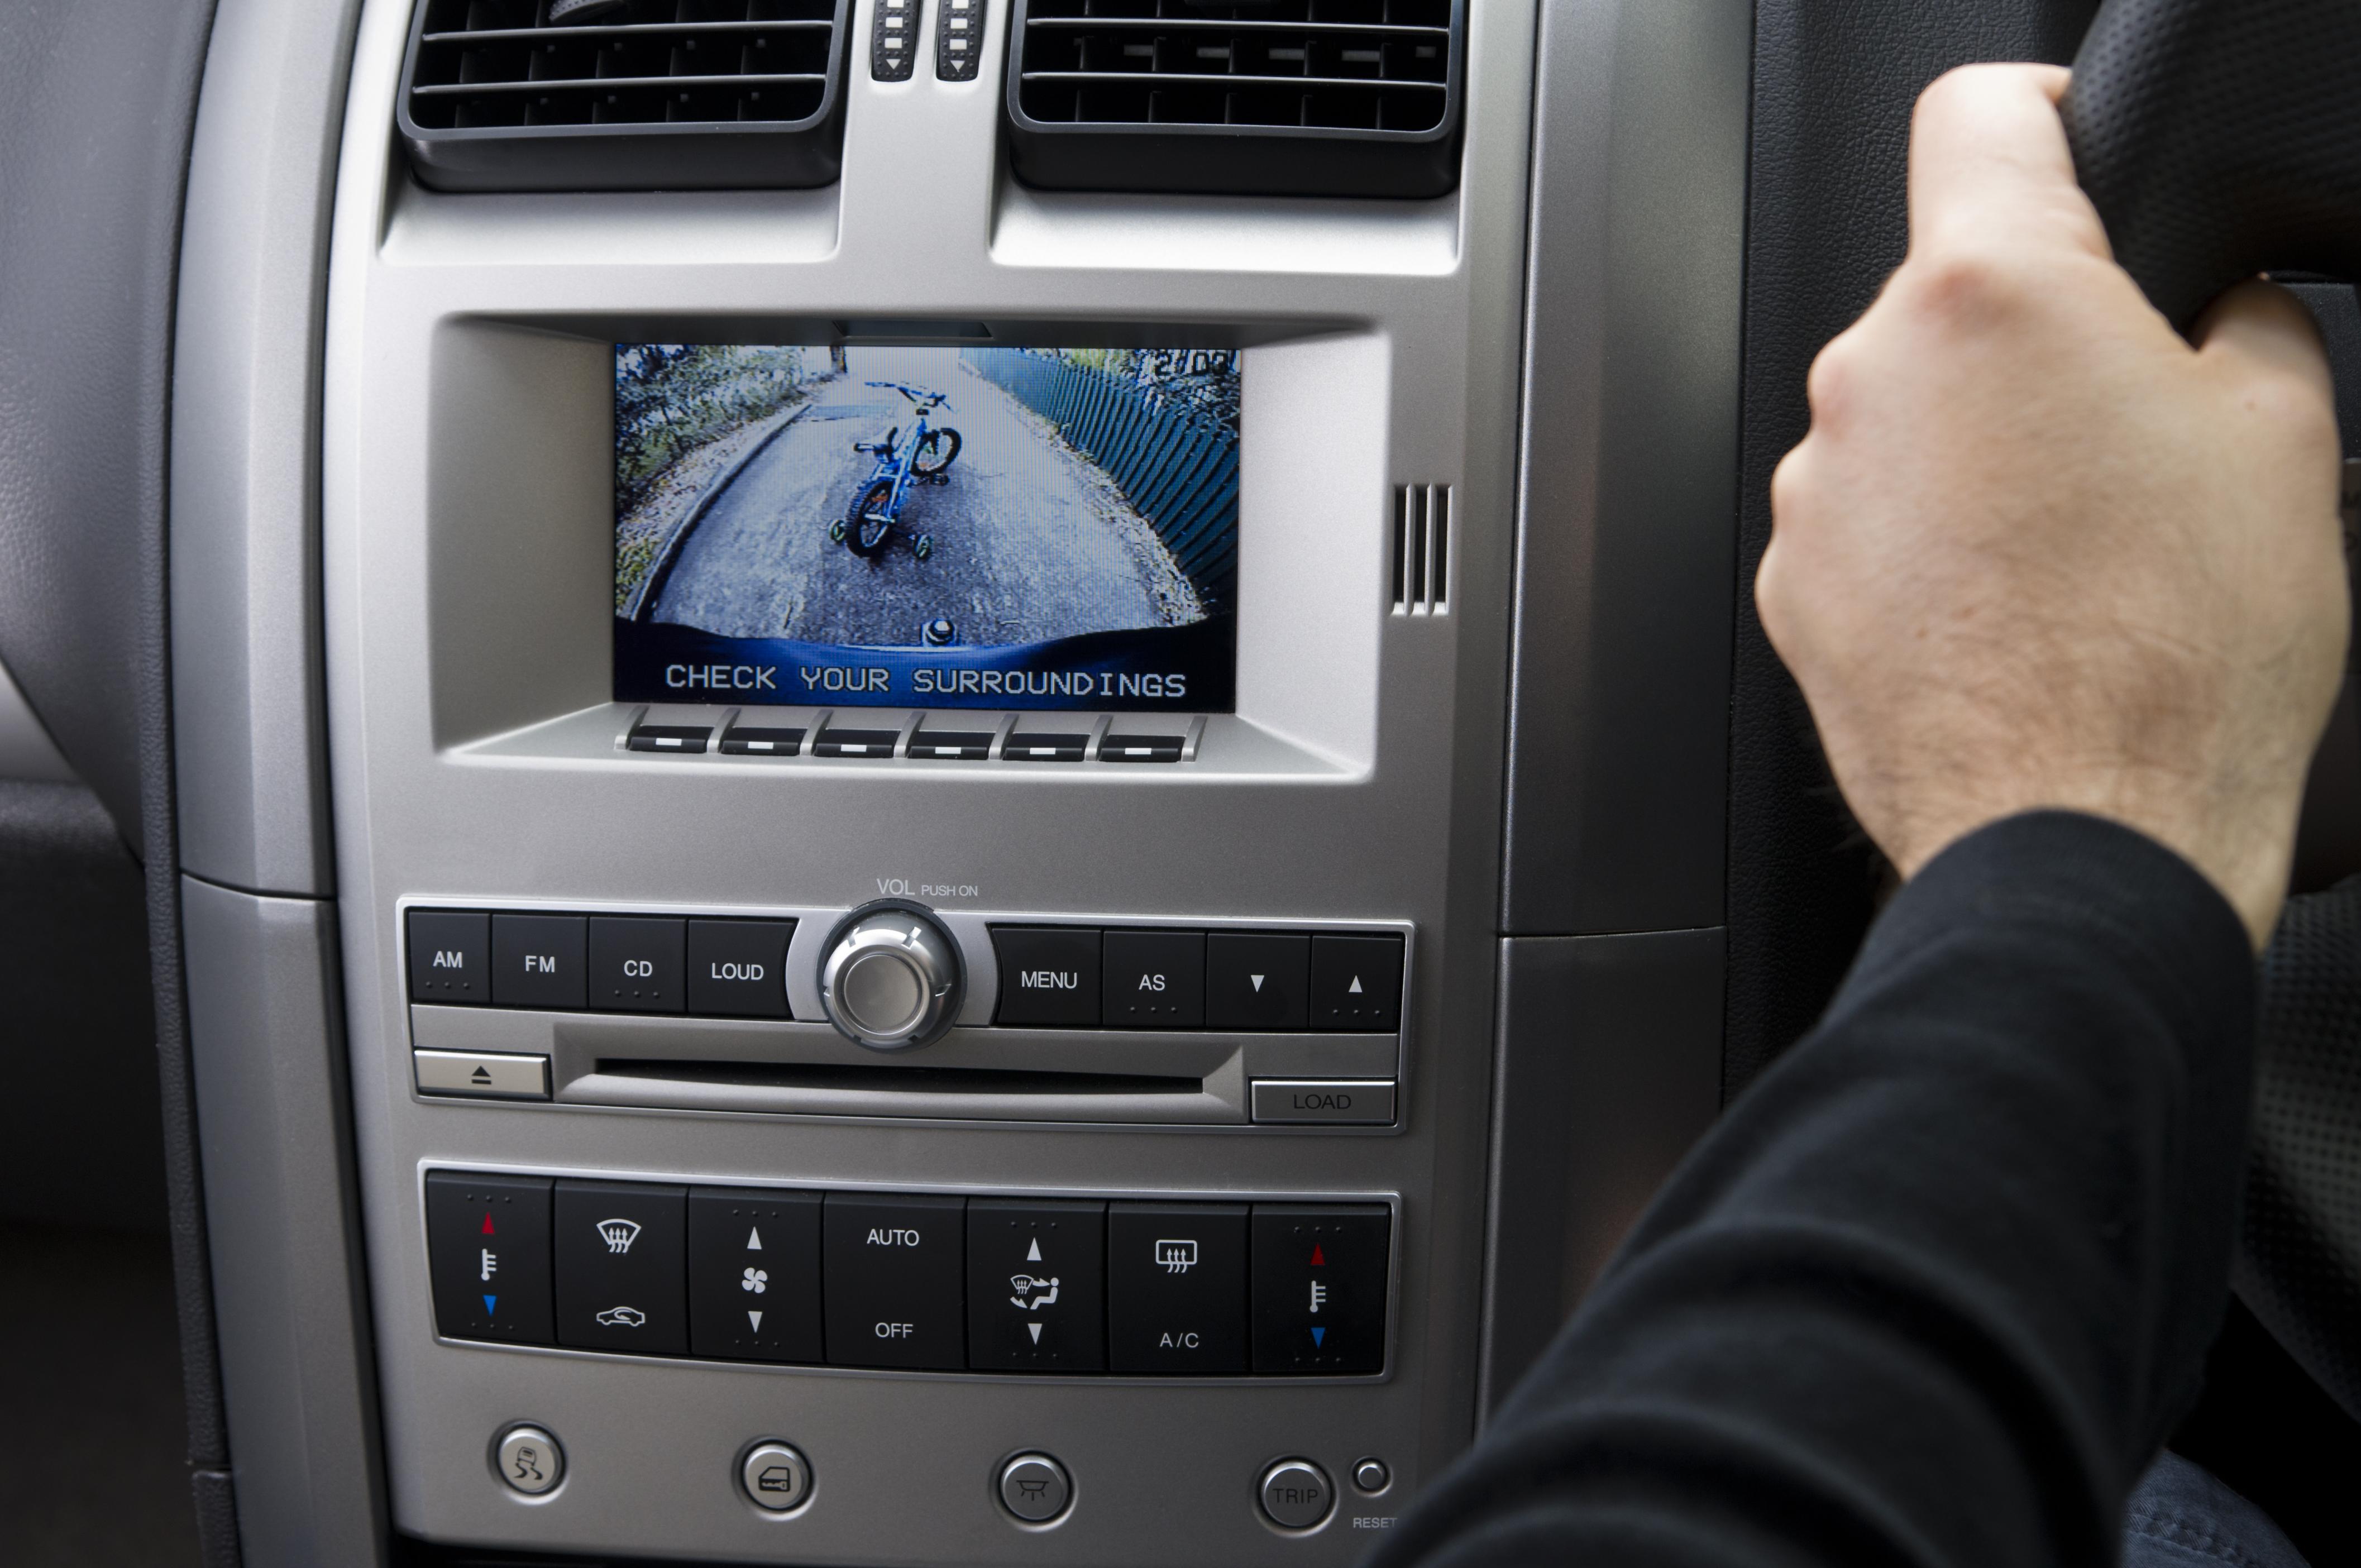 In-dash reversing camera on car (RHD)